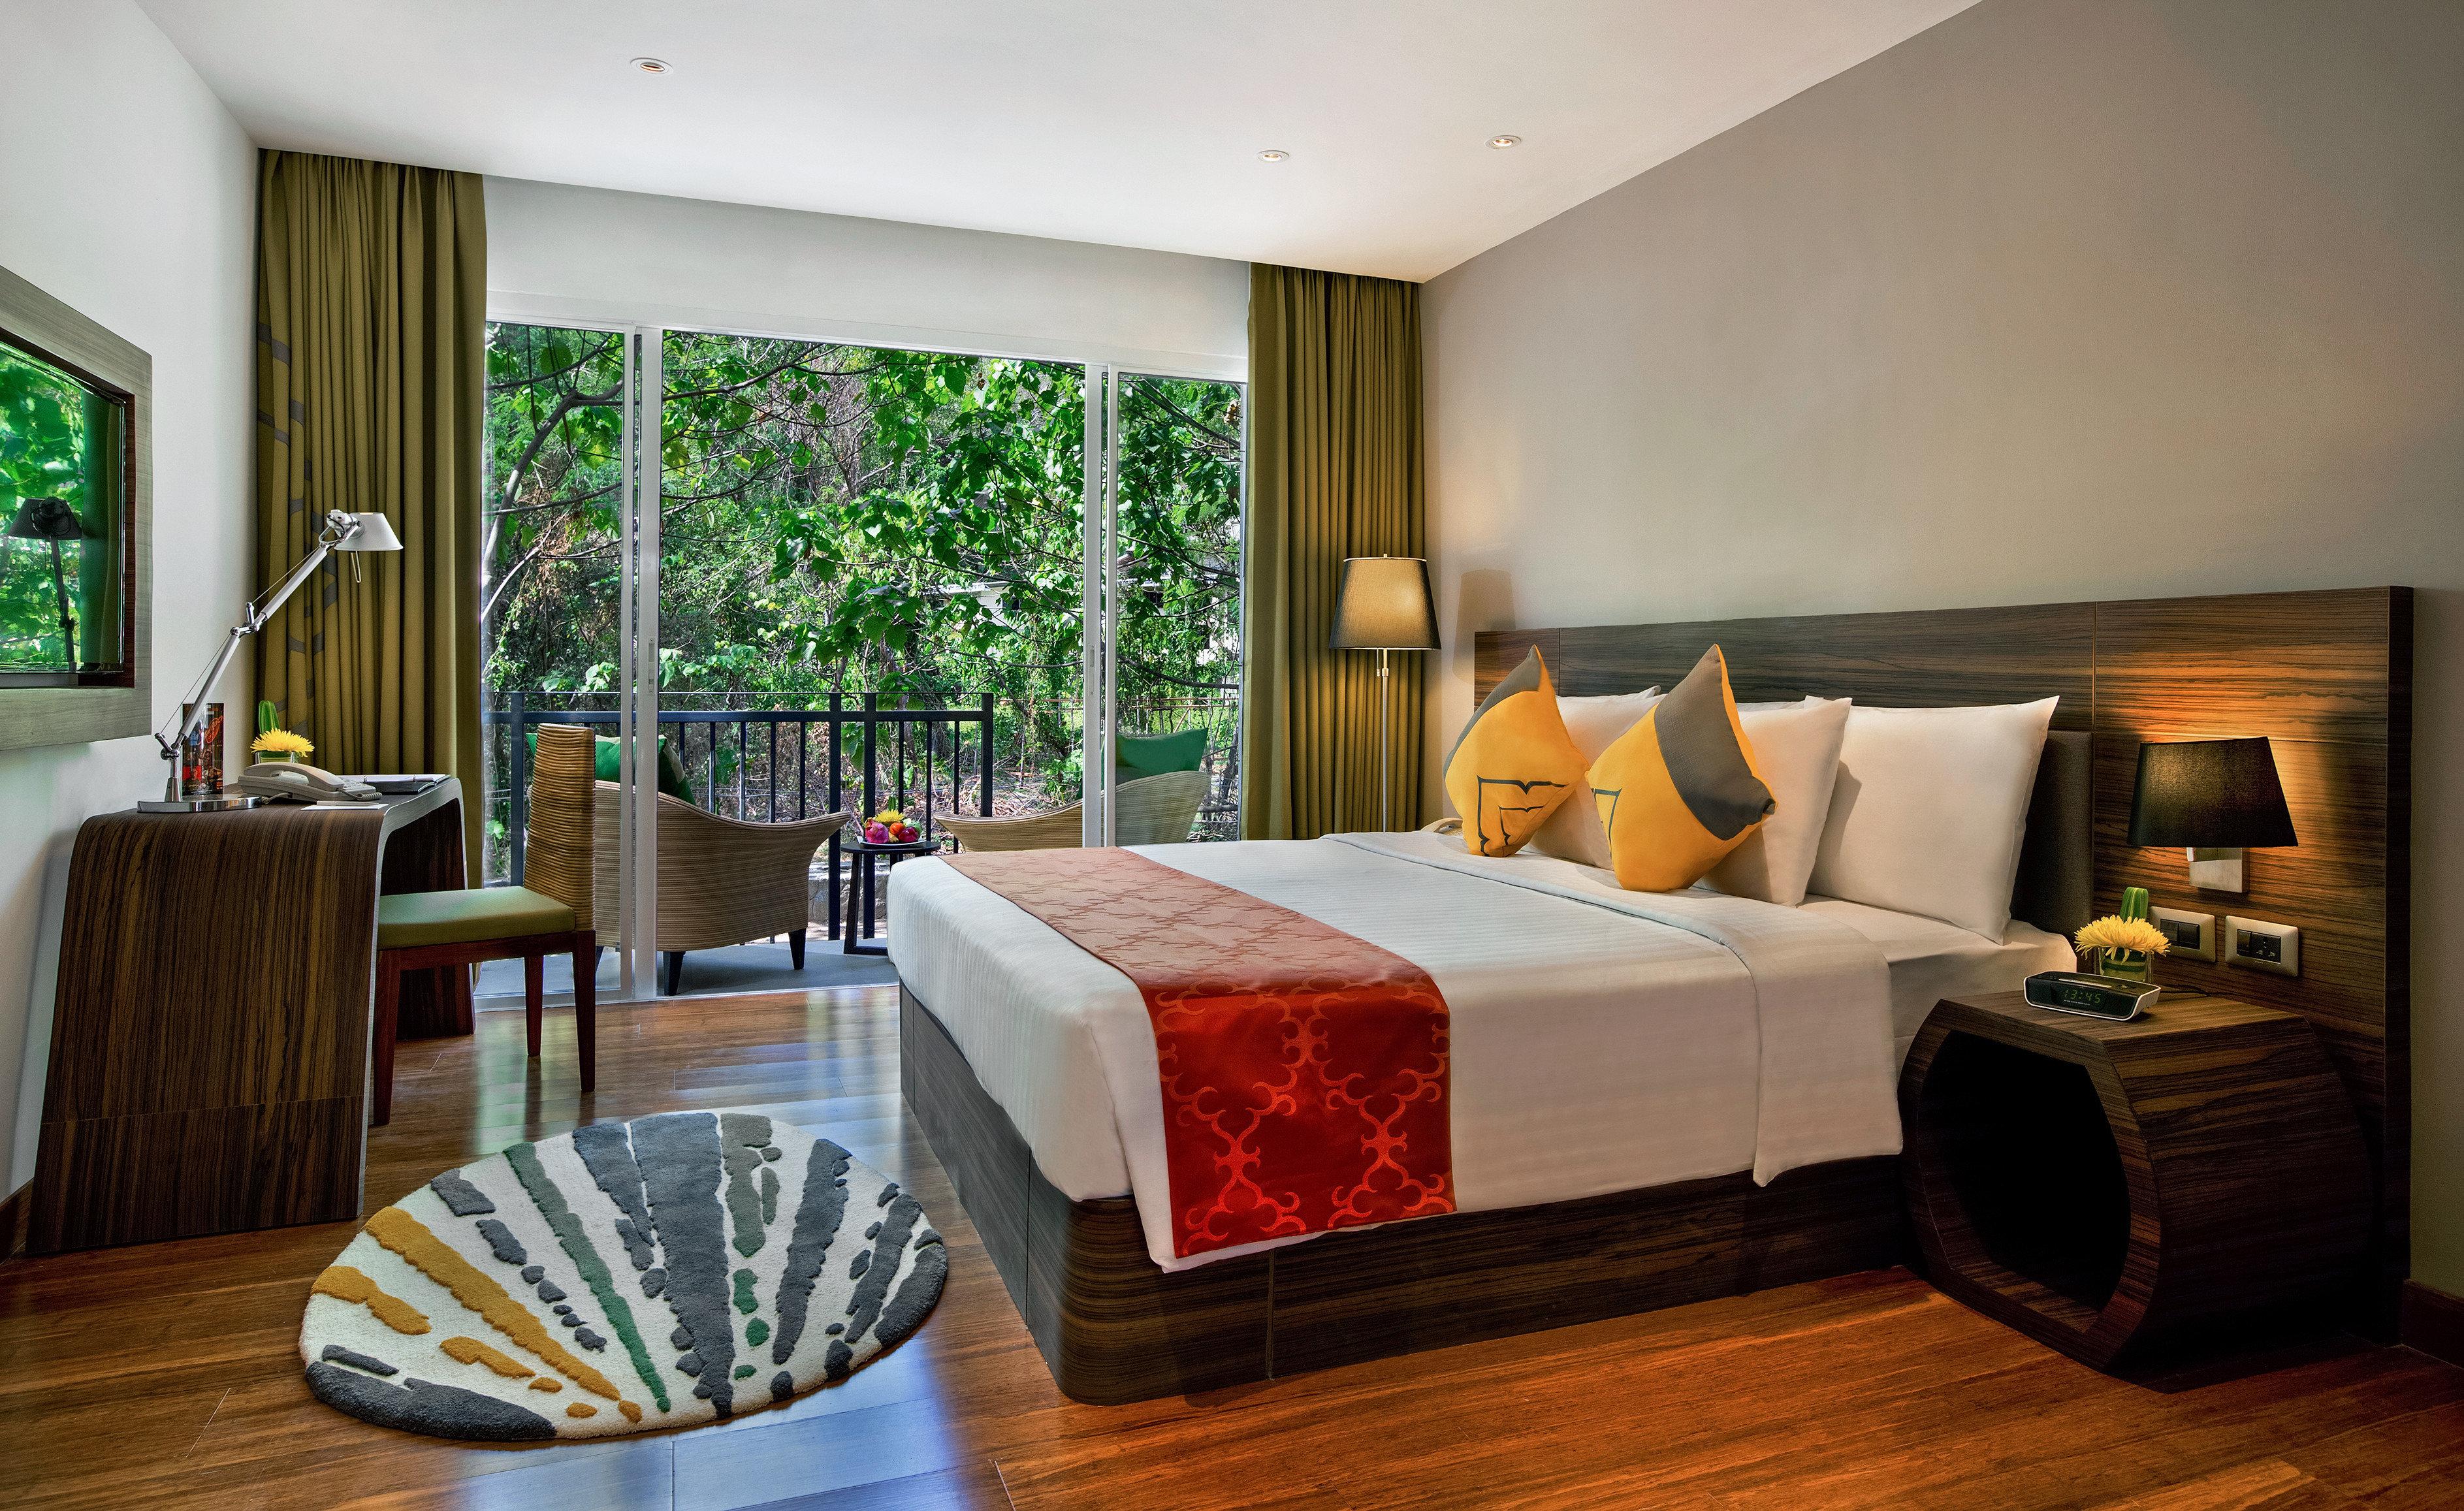 Bedroom Family Patio Resort property Suite living room condominium home Villa